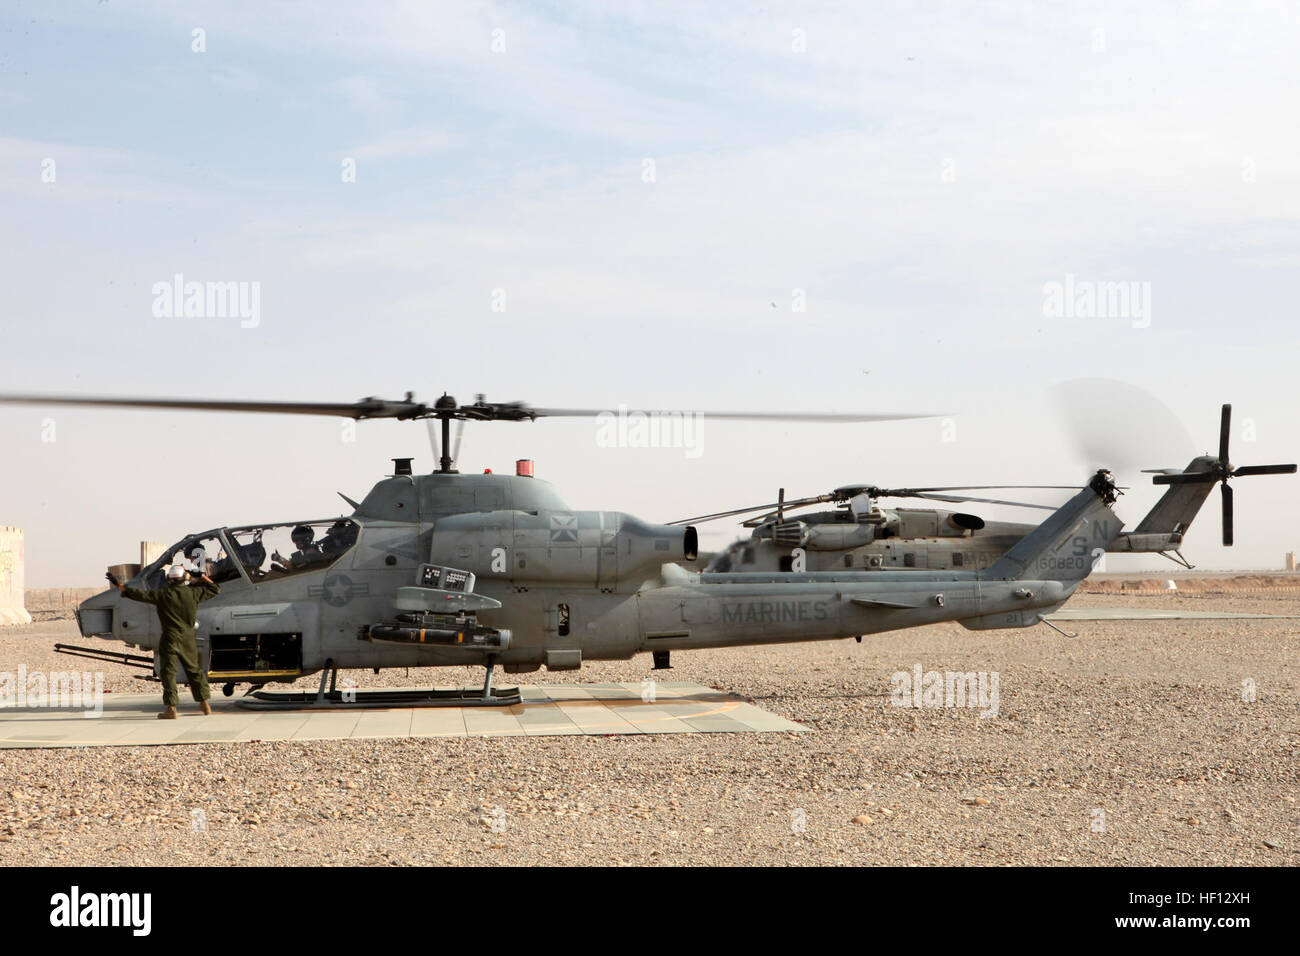 A U.S. Marine Corps AH-1W Super Cobra attack helicopter ...